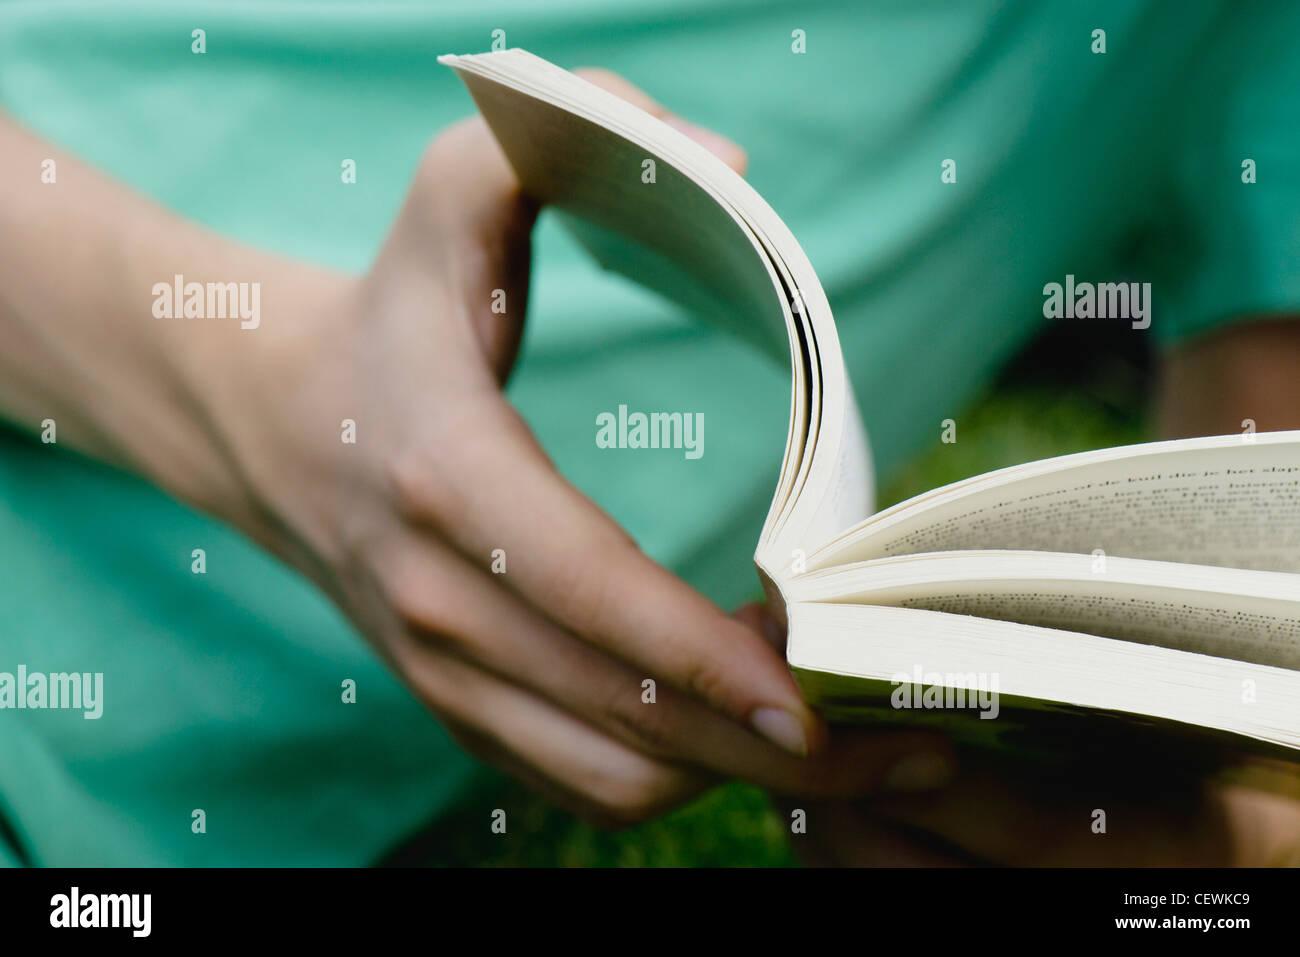 Man reading book, close-up - Stock Image